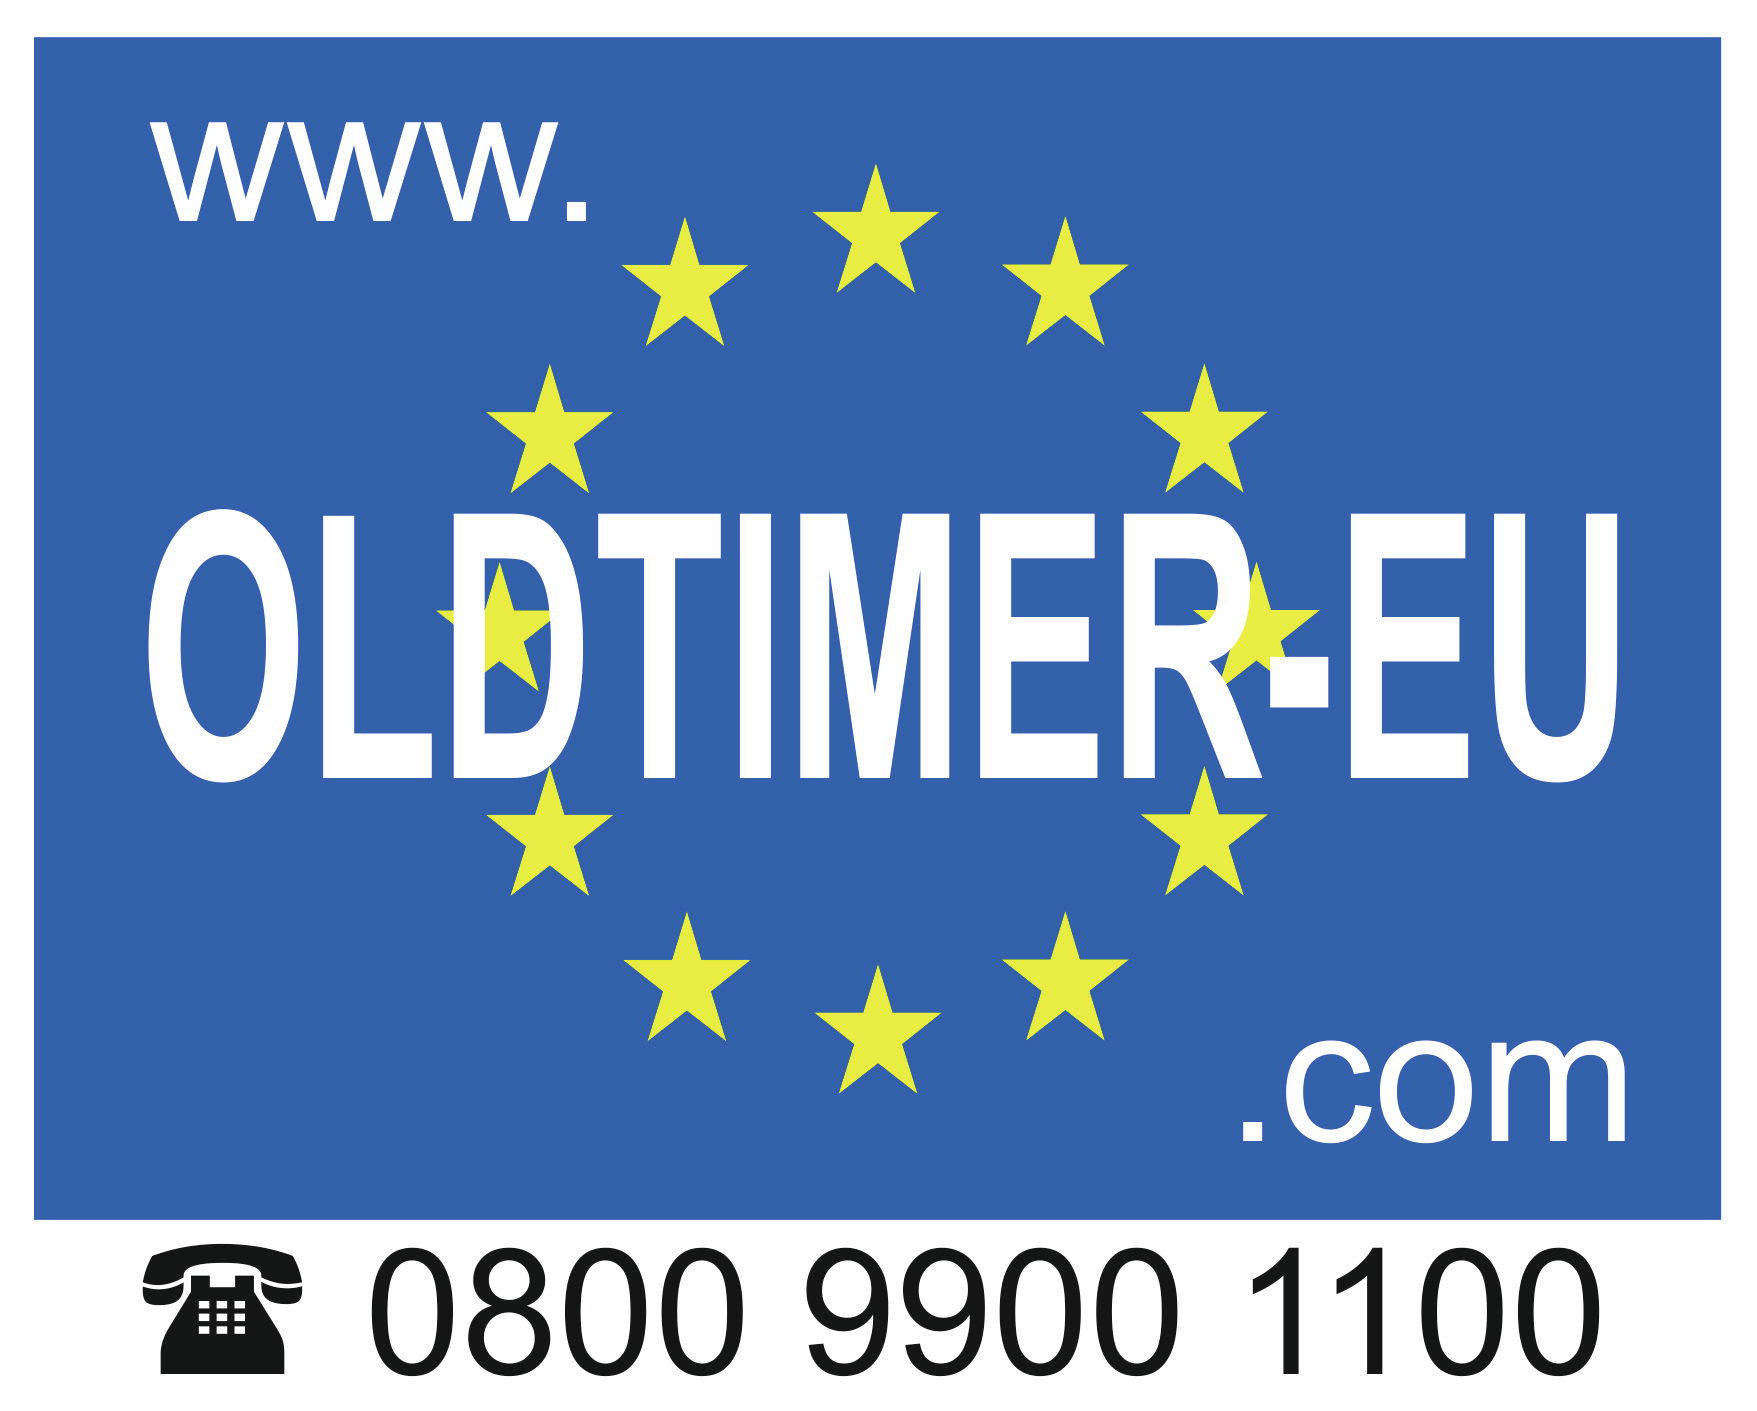 www.oldtimer-eu.com Gutachten in Ulm und Umgebung